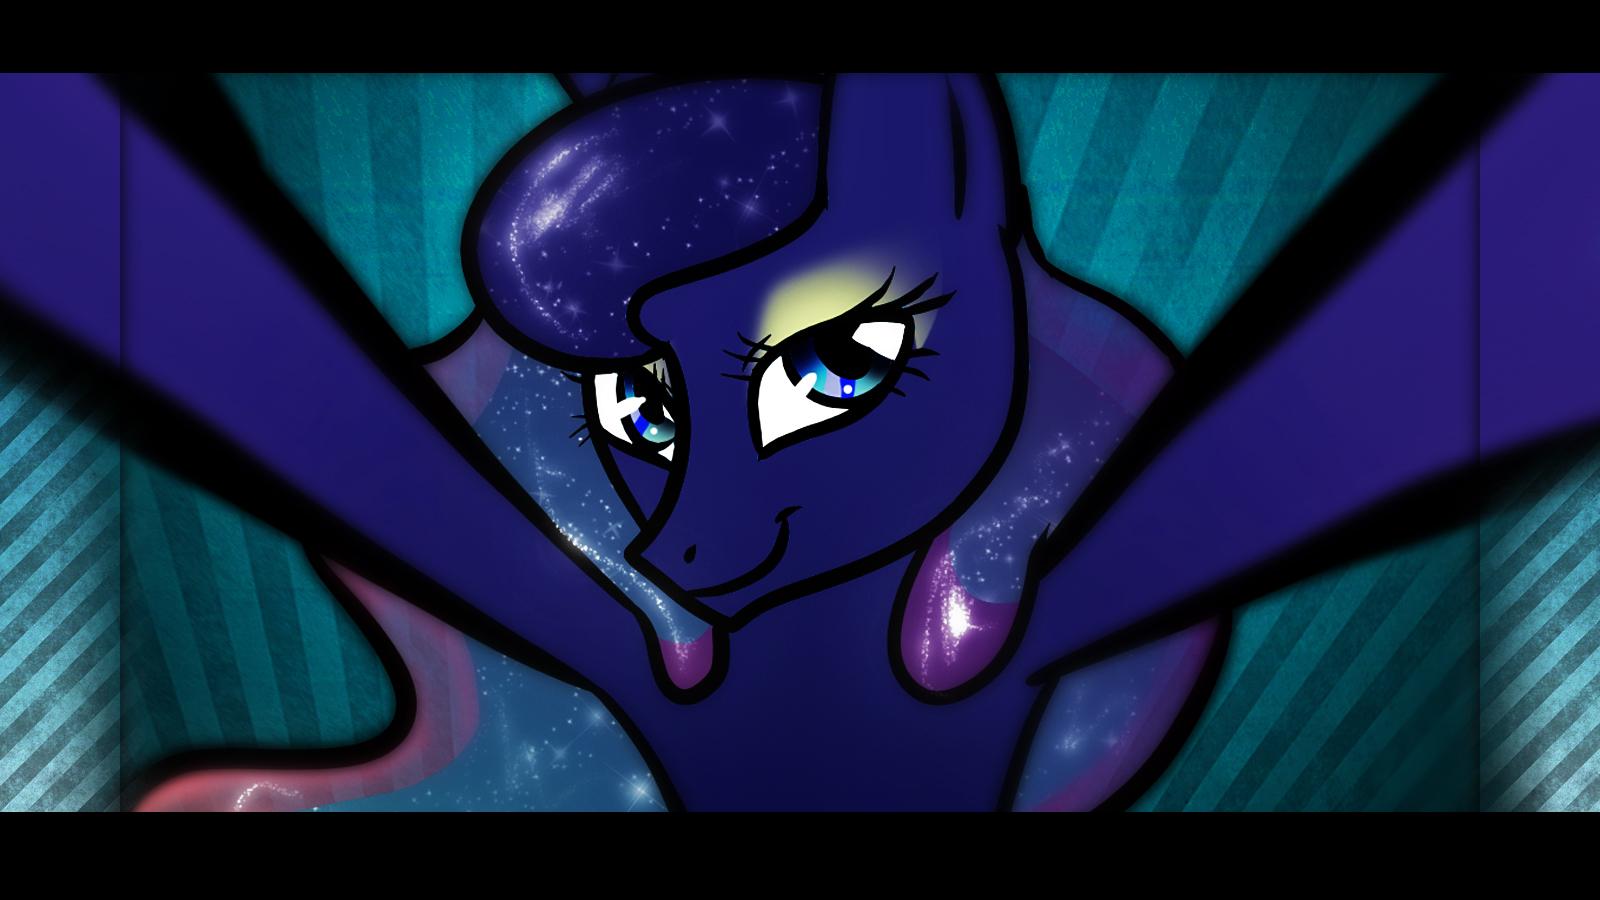 Lusty Luna wants you | My Little Pony: Friendship is Magic